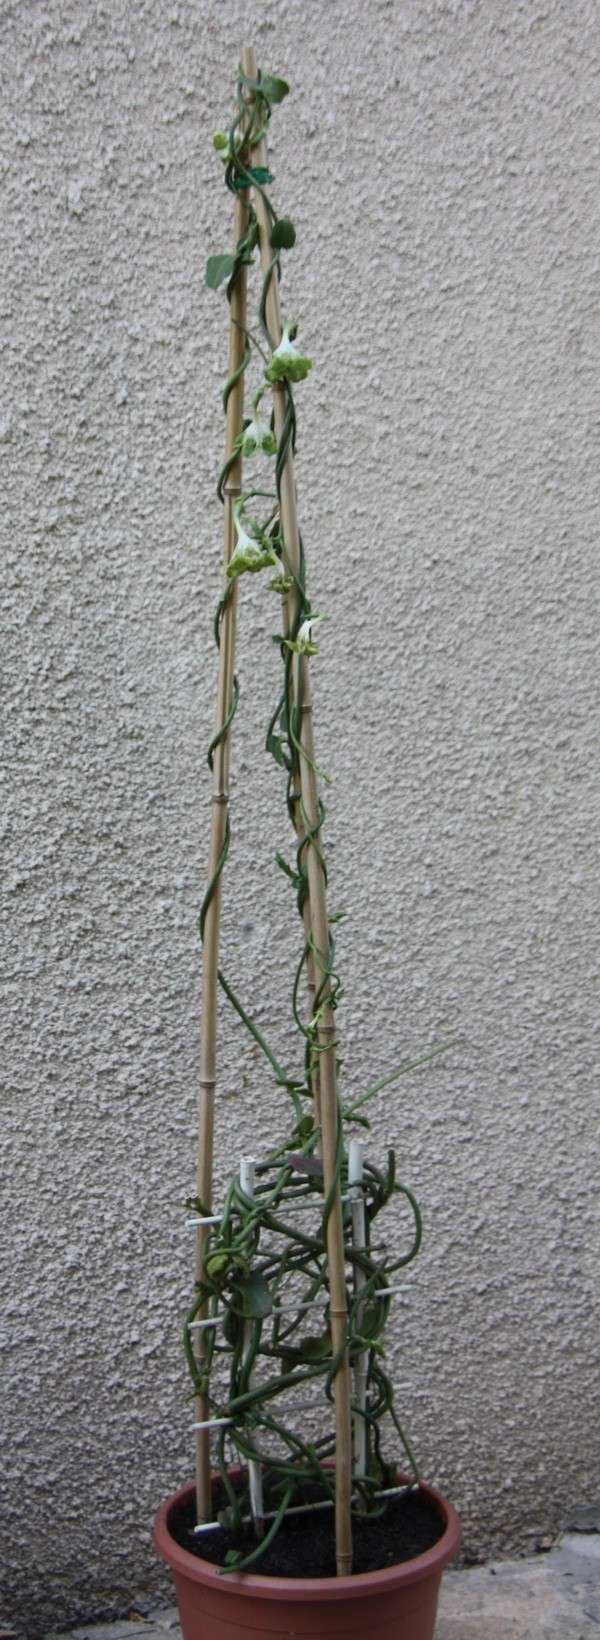 Ceropegia sandersoni ou plante parachute Img_9210